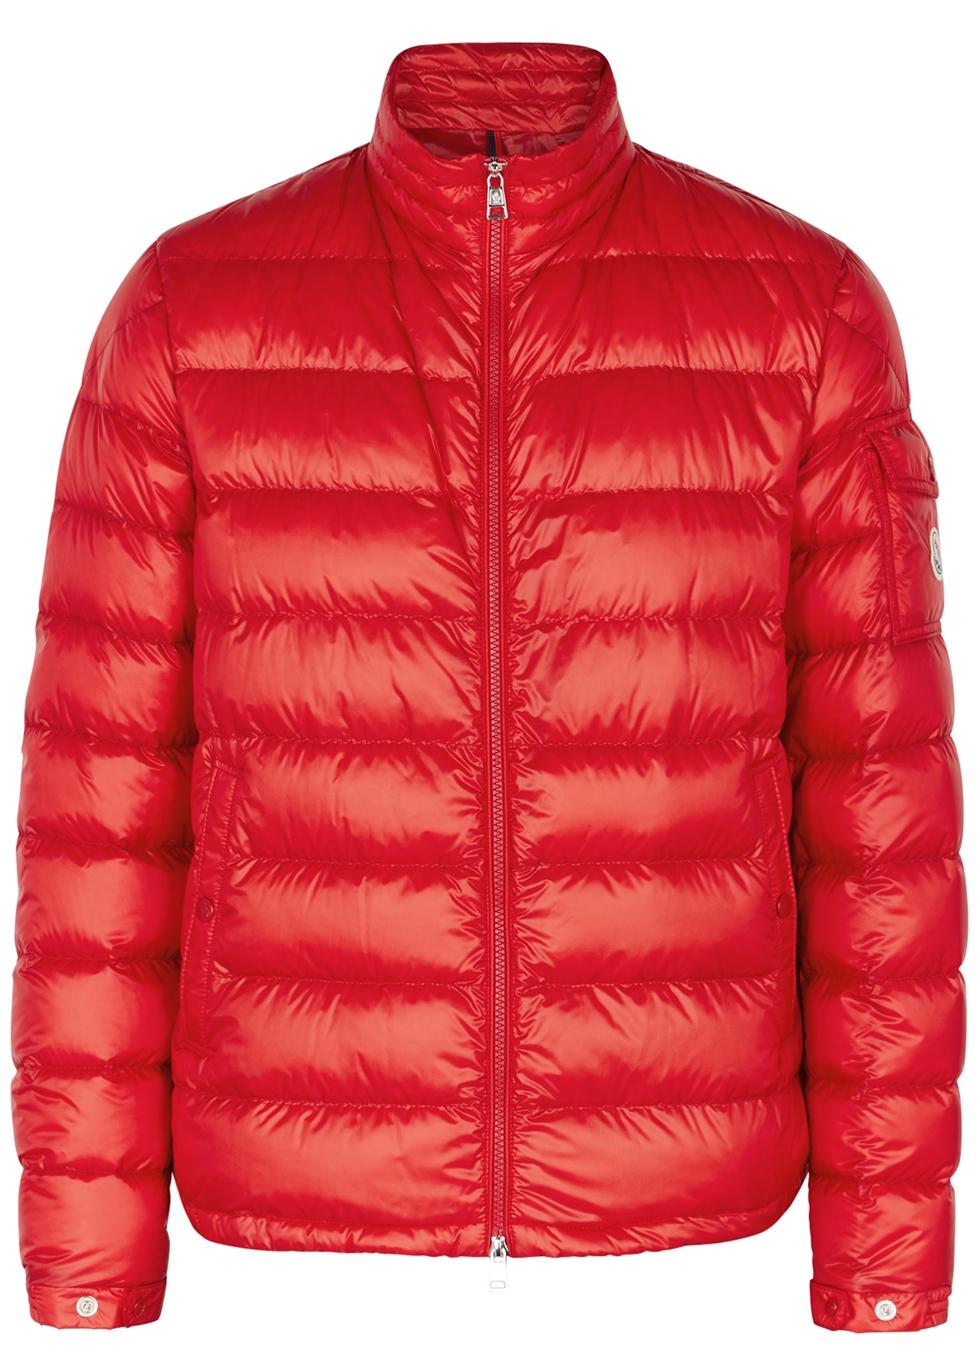 9b606ab695934 Men s Designer Jackets - Winter Jackets for Men - Harvey Nichols